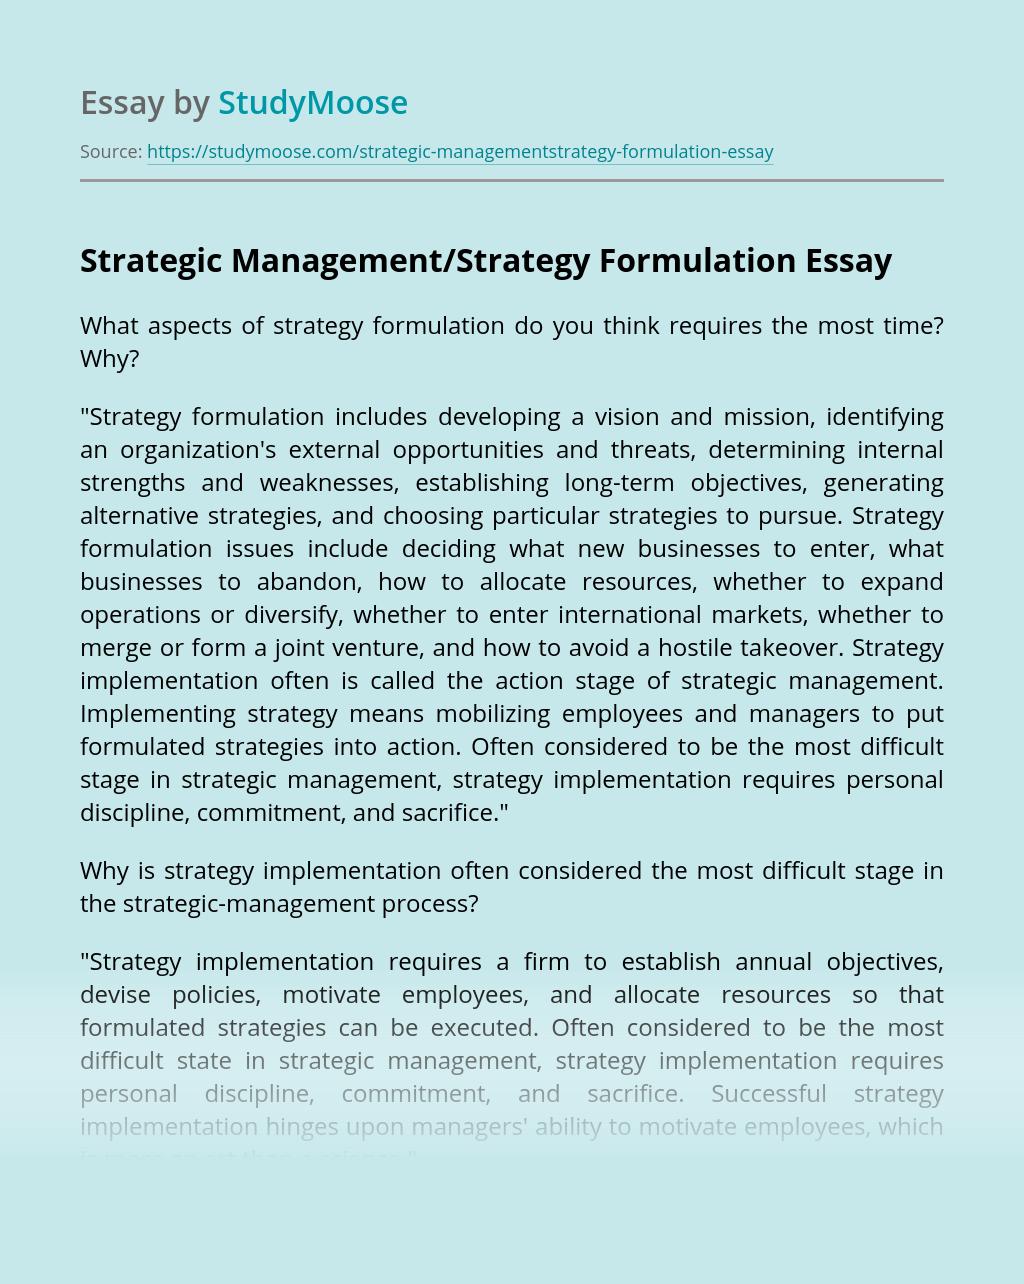 Strategic Management/Strategy Formulation